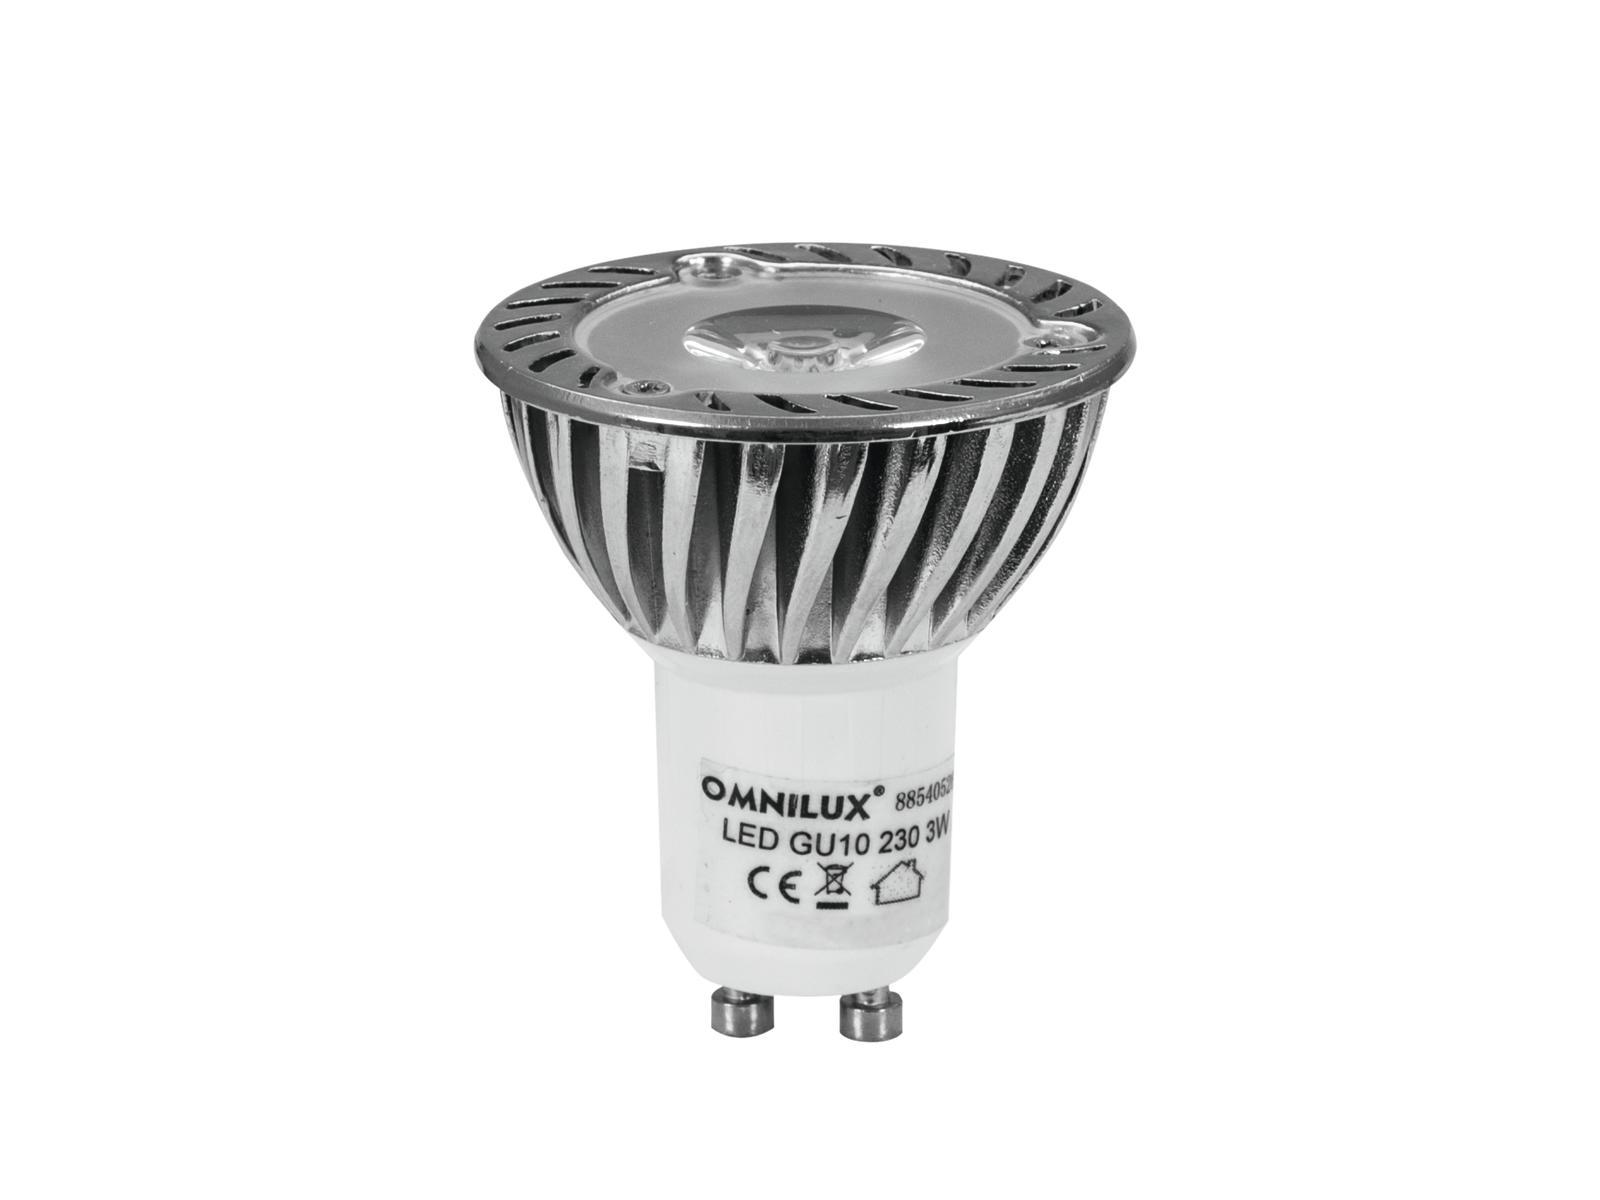 Lampada a led rosso GU-10 230V 1x3W 3000K OMNILUX